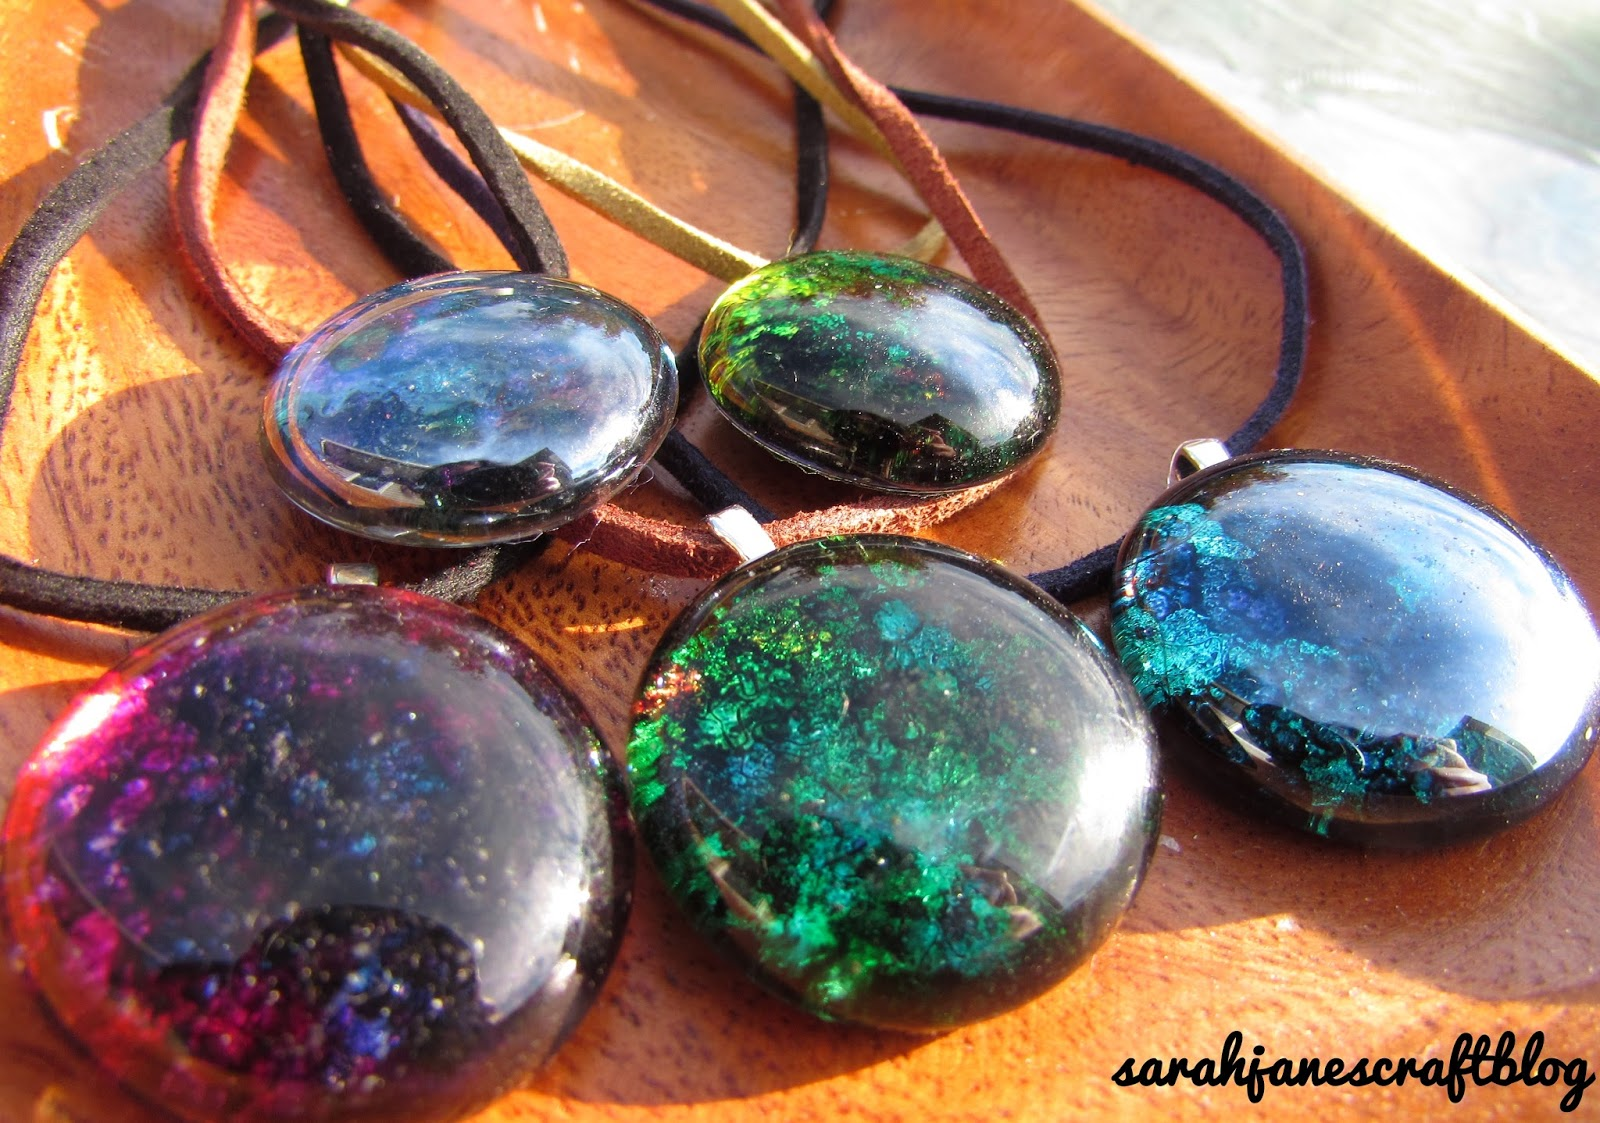 Sarah jane 39 s craft blog foil tape backed alcohol ink for Glass jewels for crafts